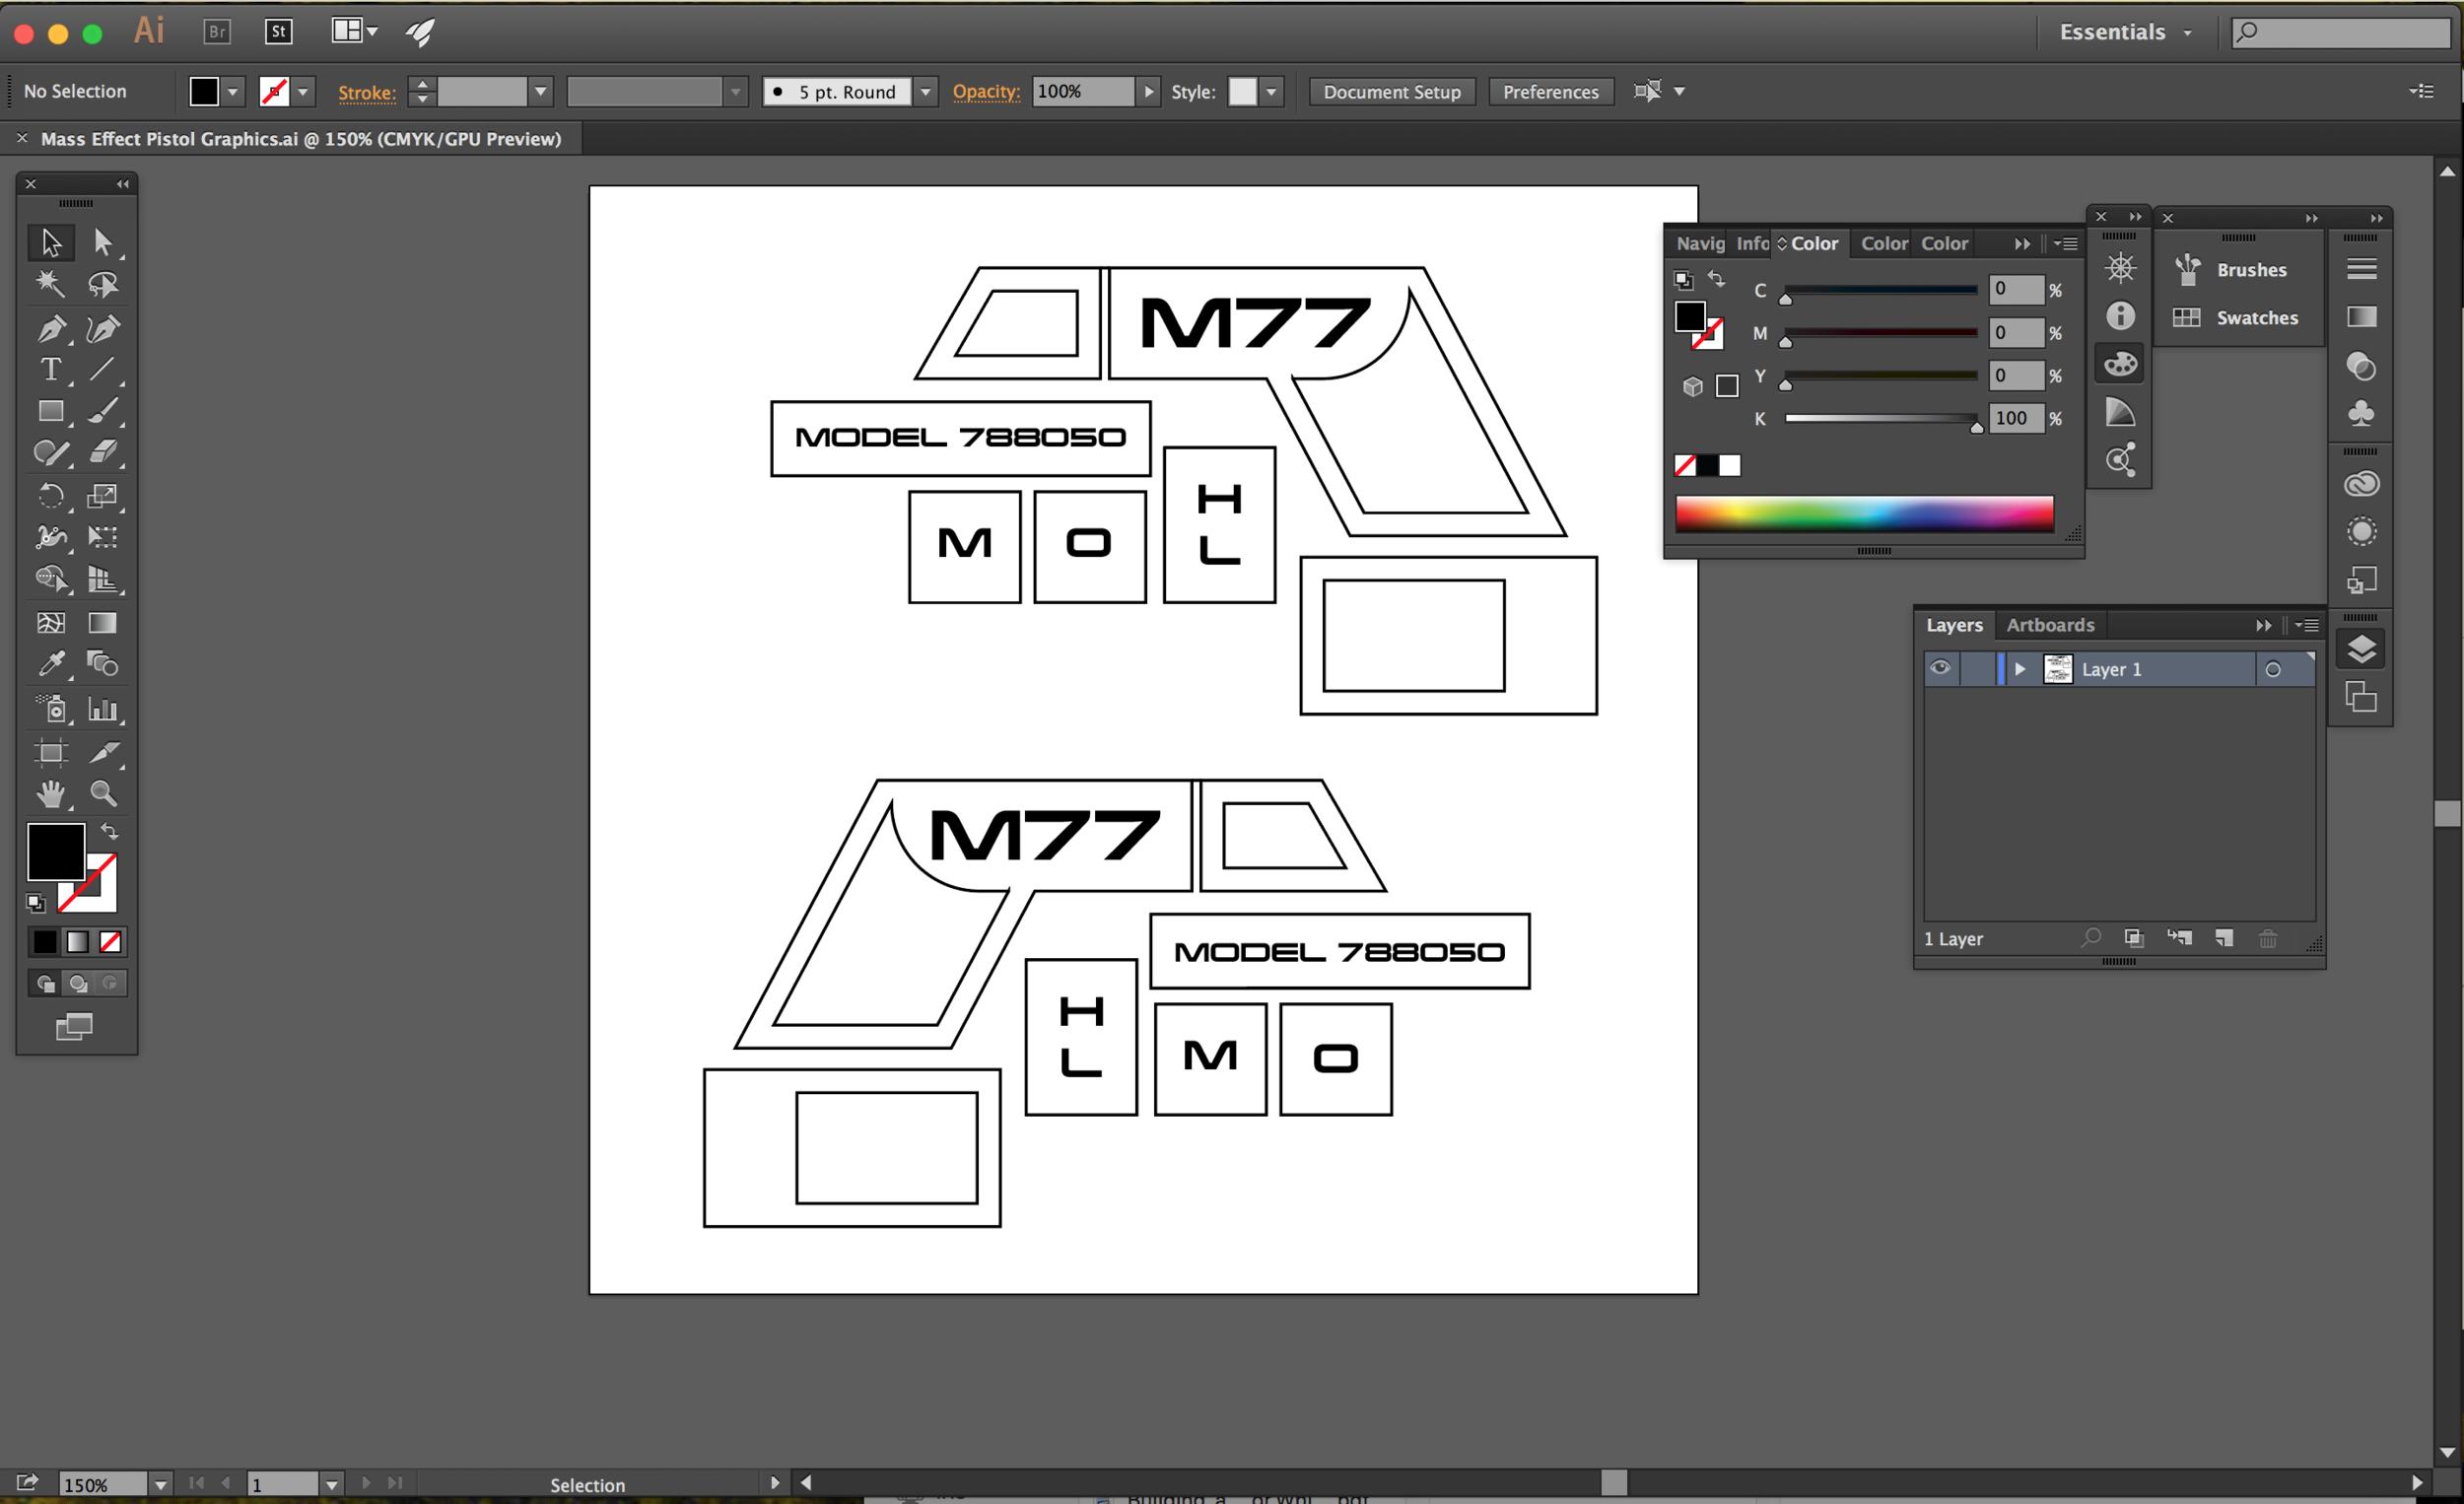 Vinyl stencils for 3D Printed Cosplay Mass Effect Pistol created in Adobe Illustrator